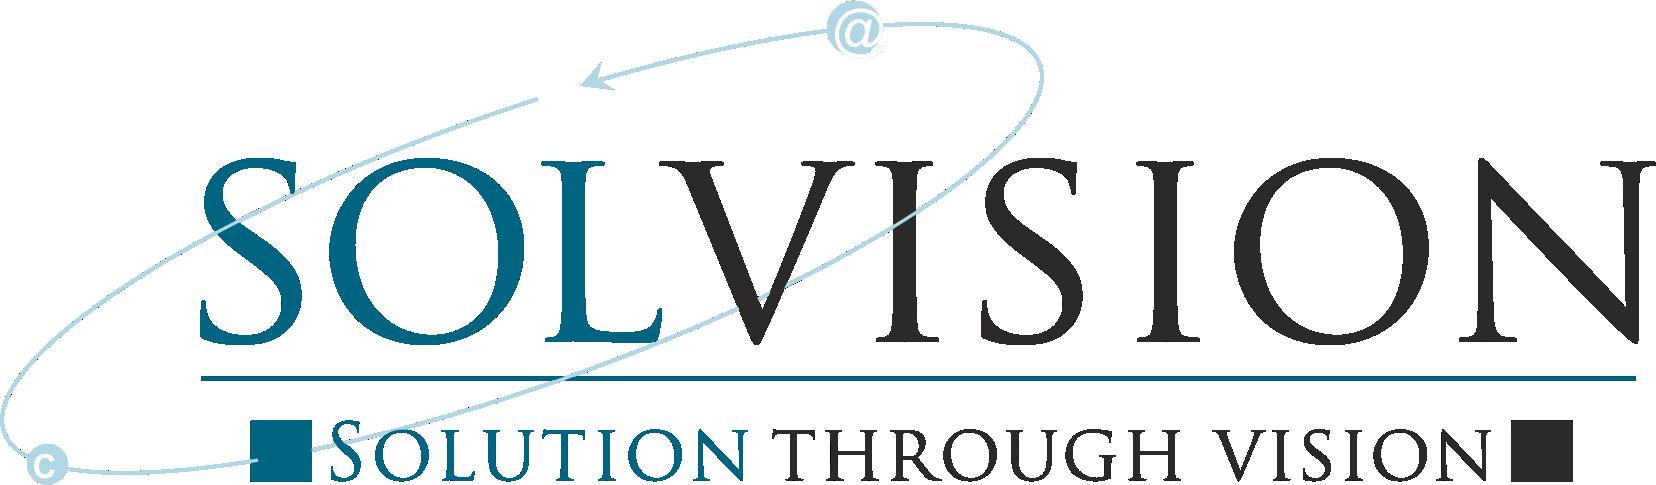 Parking Solvision logo